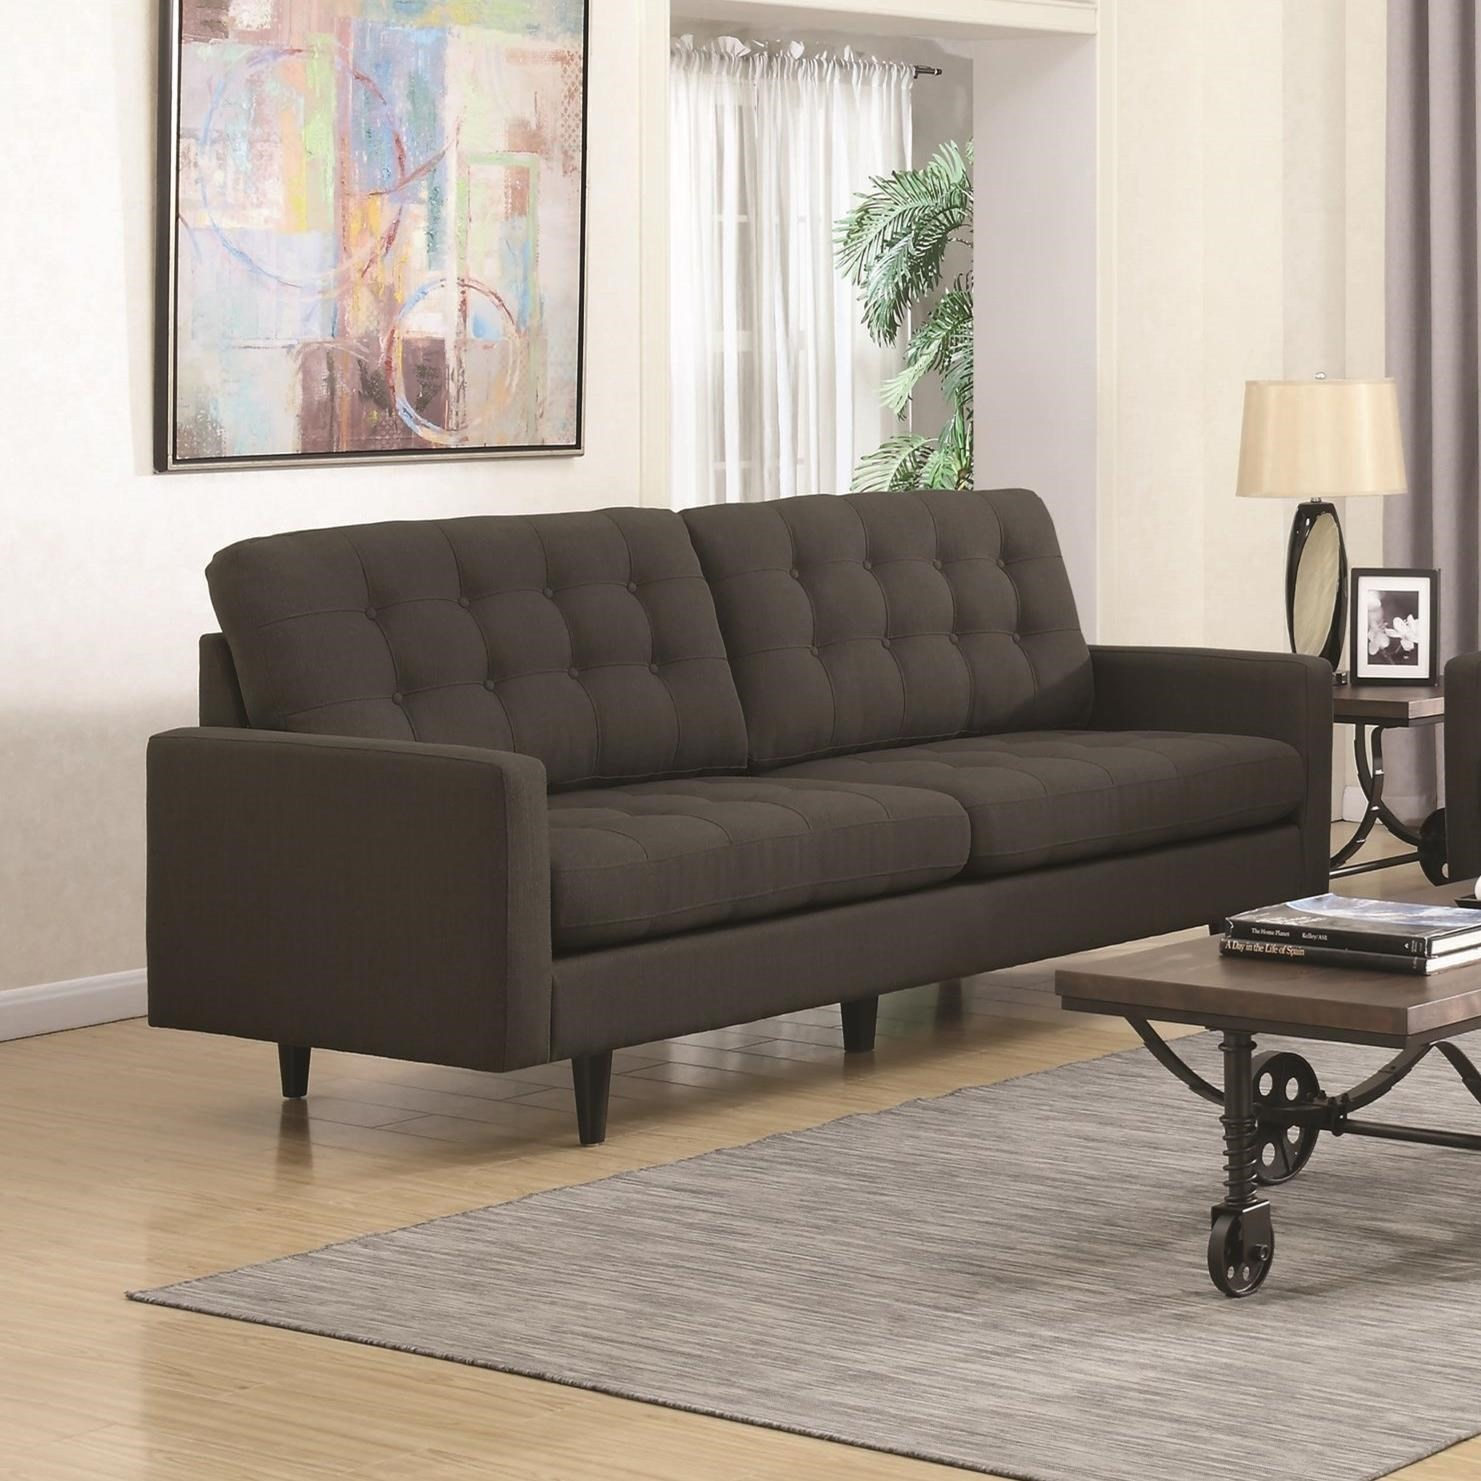 Kesson Mid Century Modern Sofa Quality Furniture At